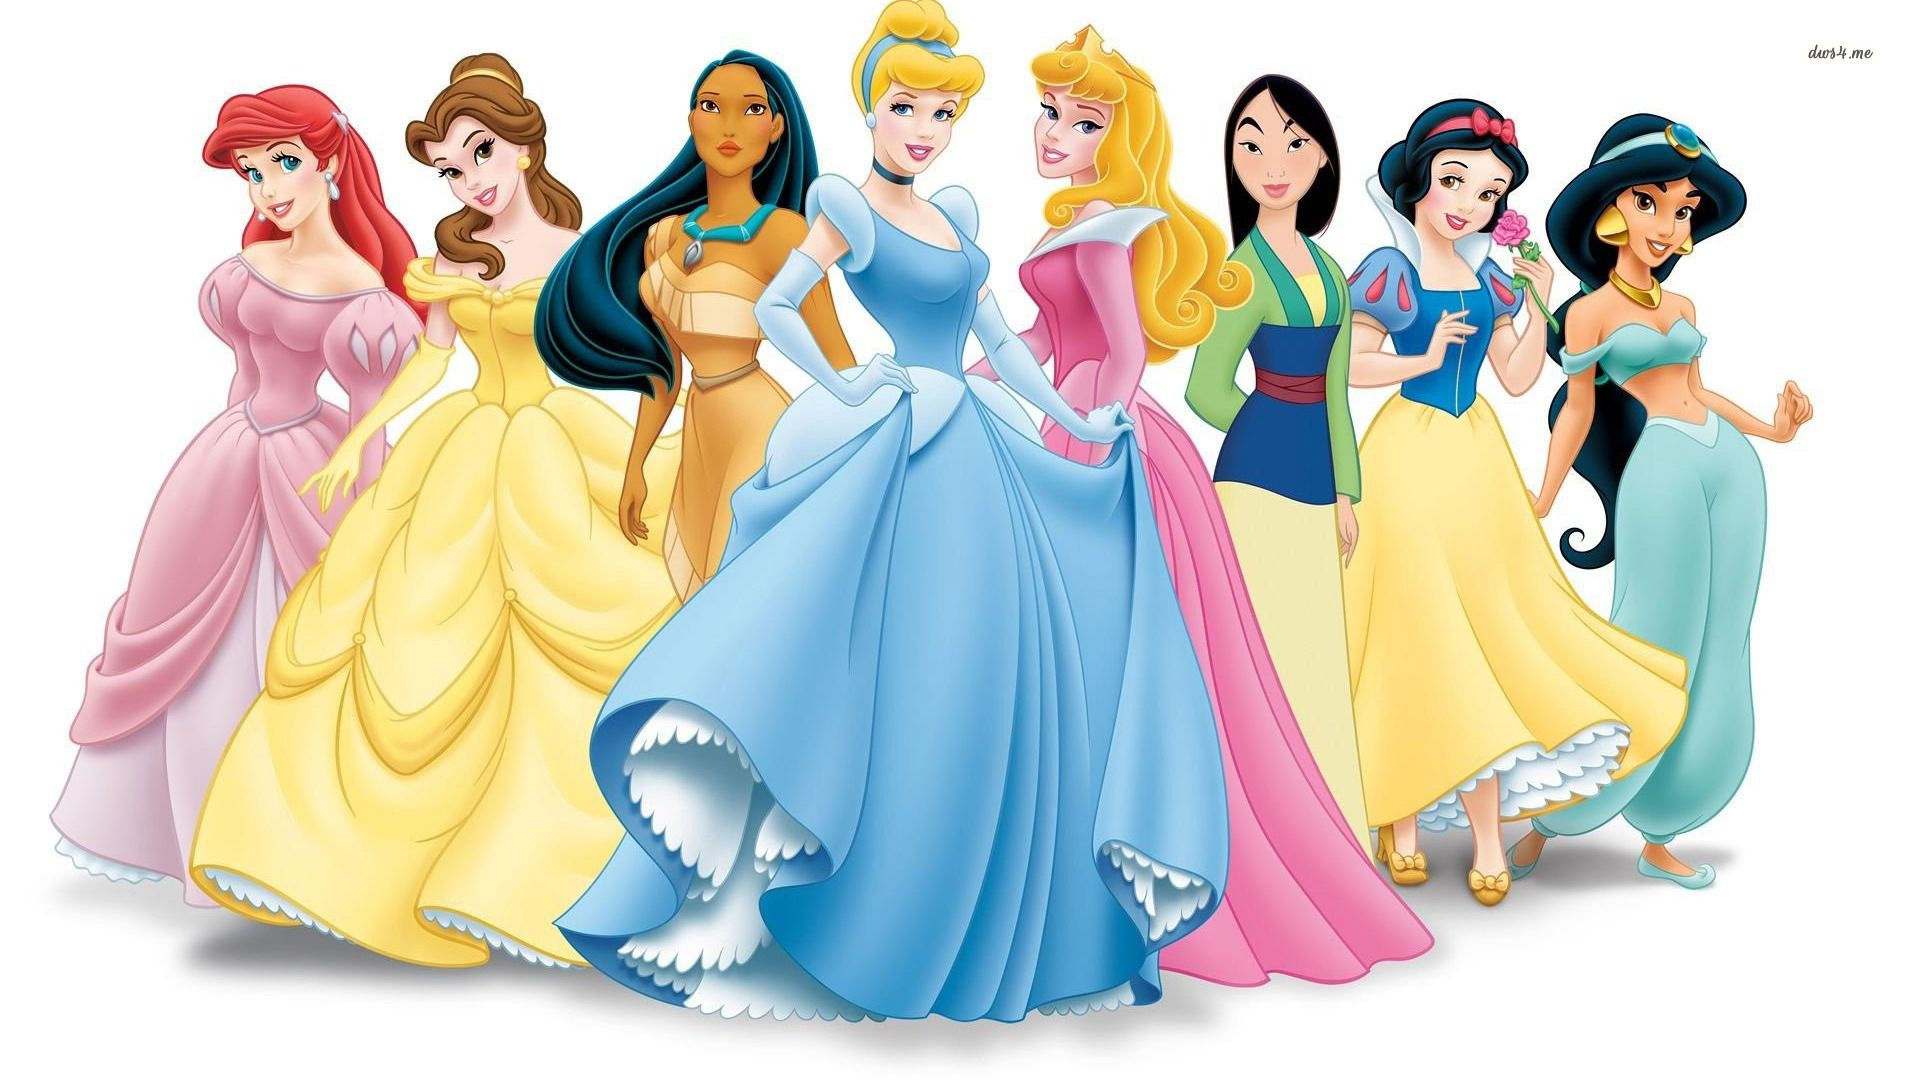 Cute Cartoon Princess Disney Princesses Wallpaper Disney In 2019